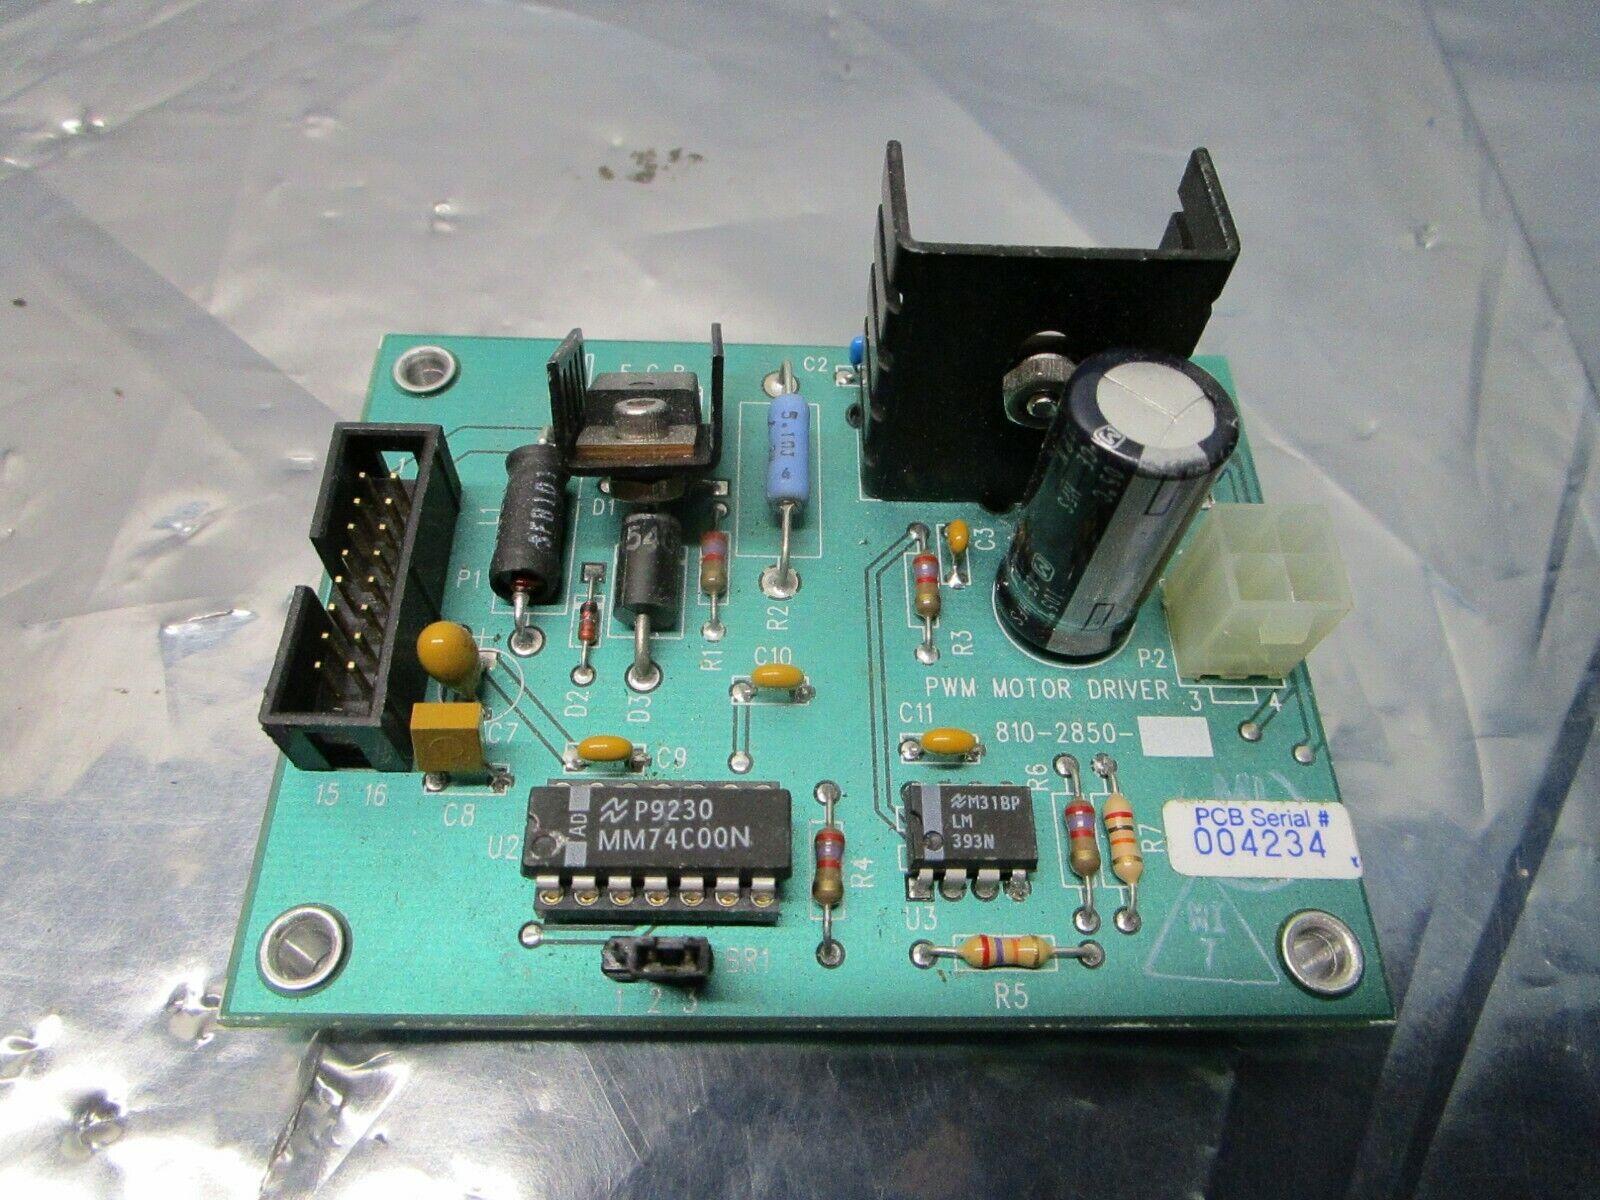 Novellus 810-2850 PWM Motor Driver Board, PCB, 101219